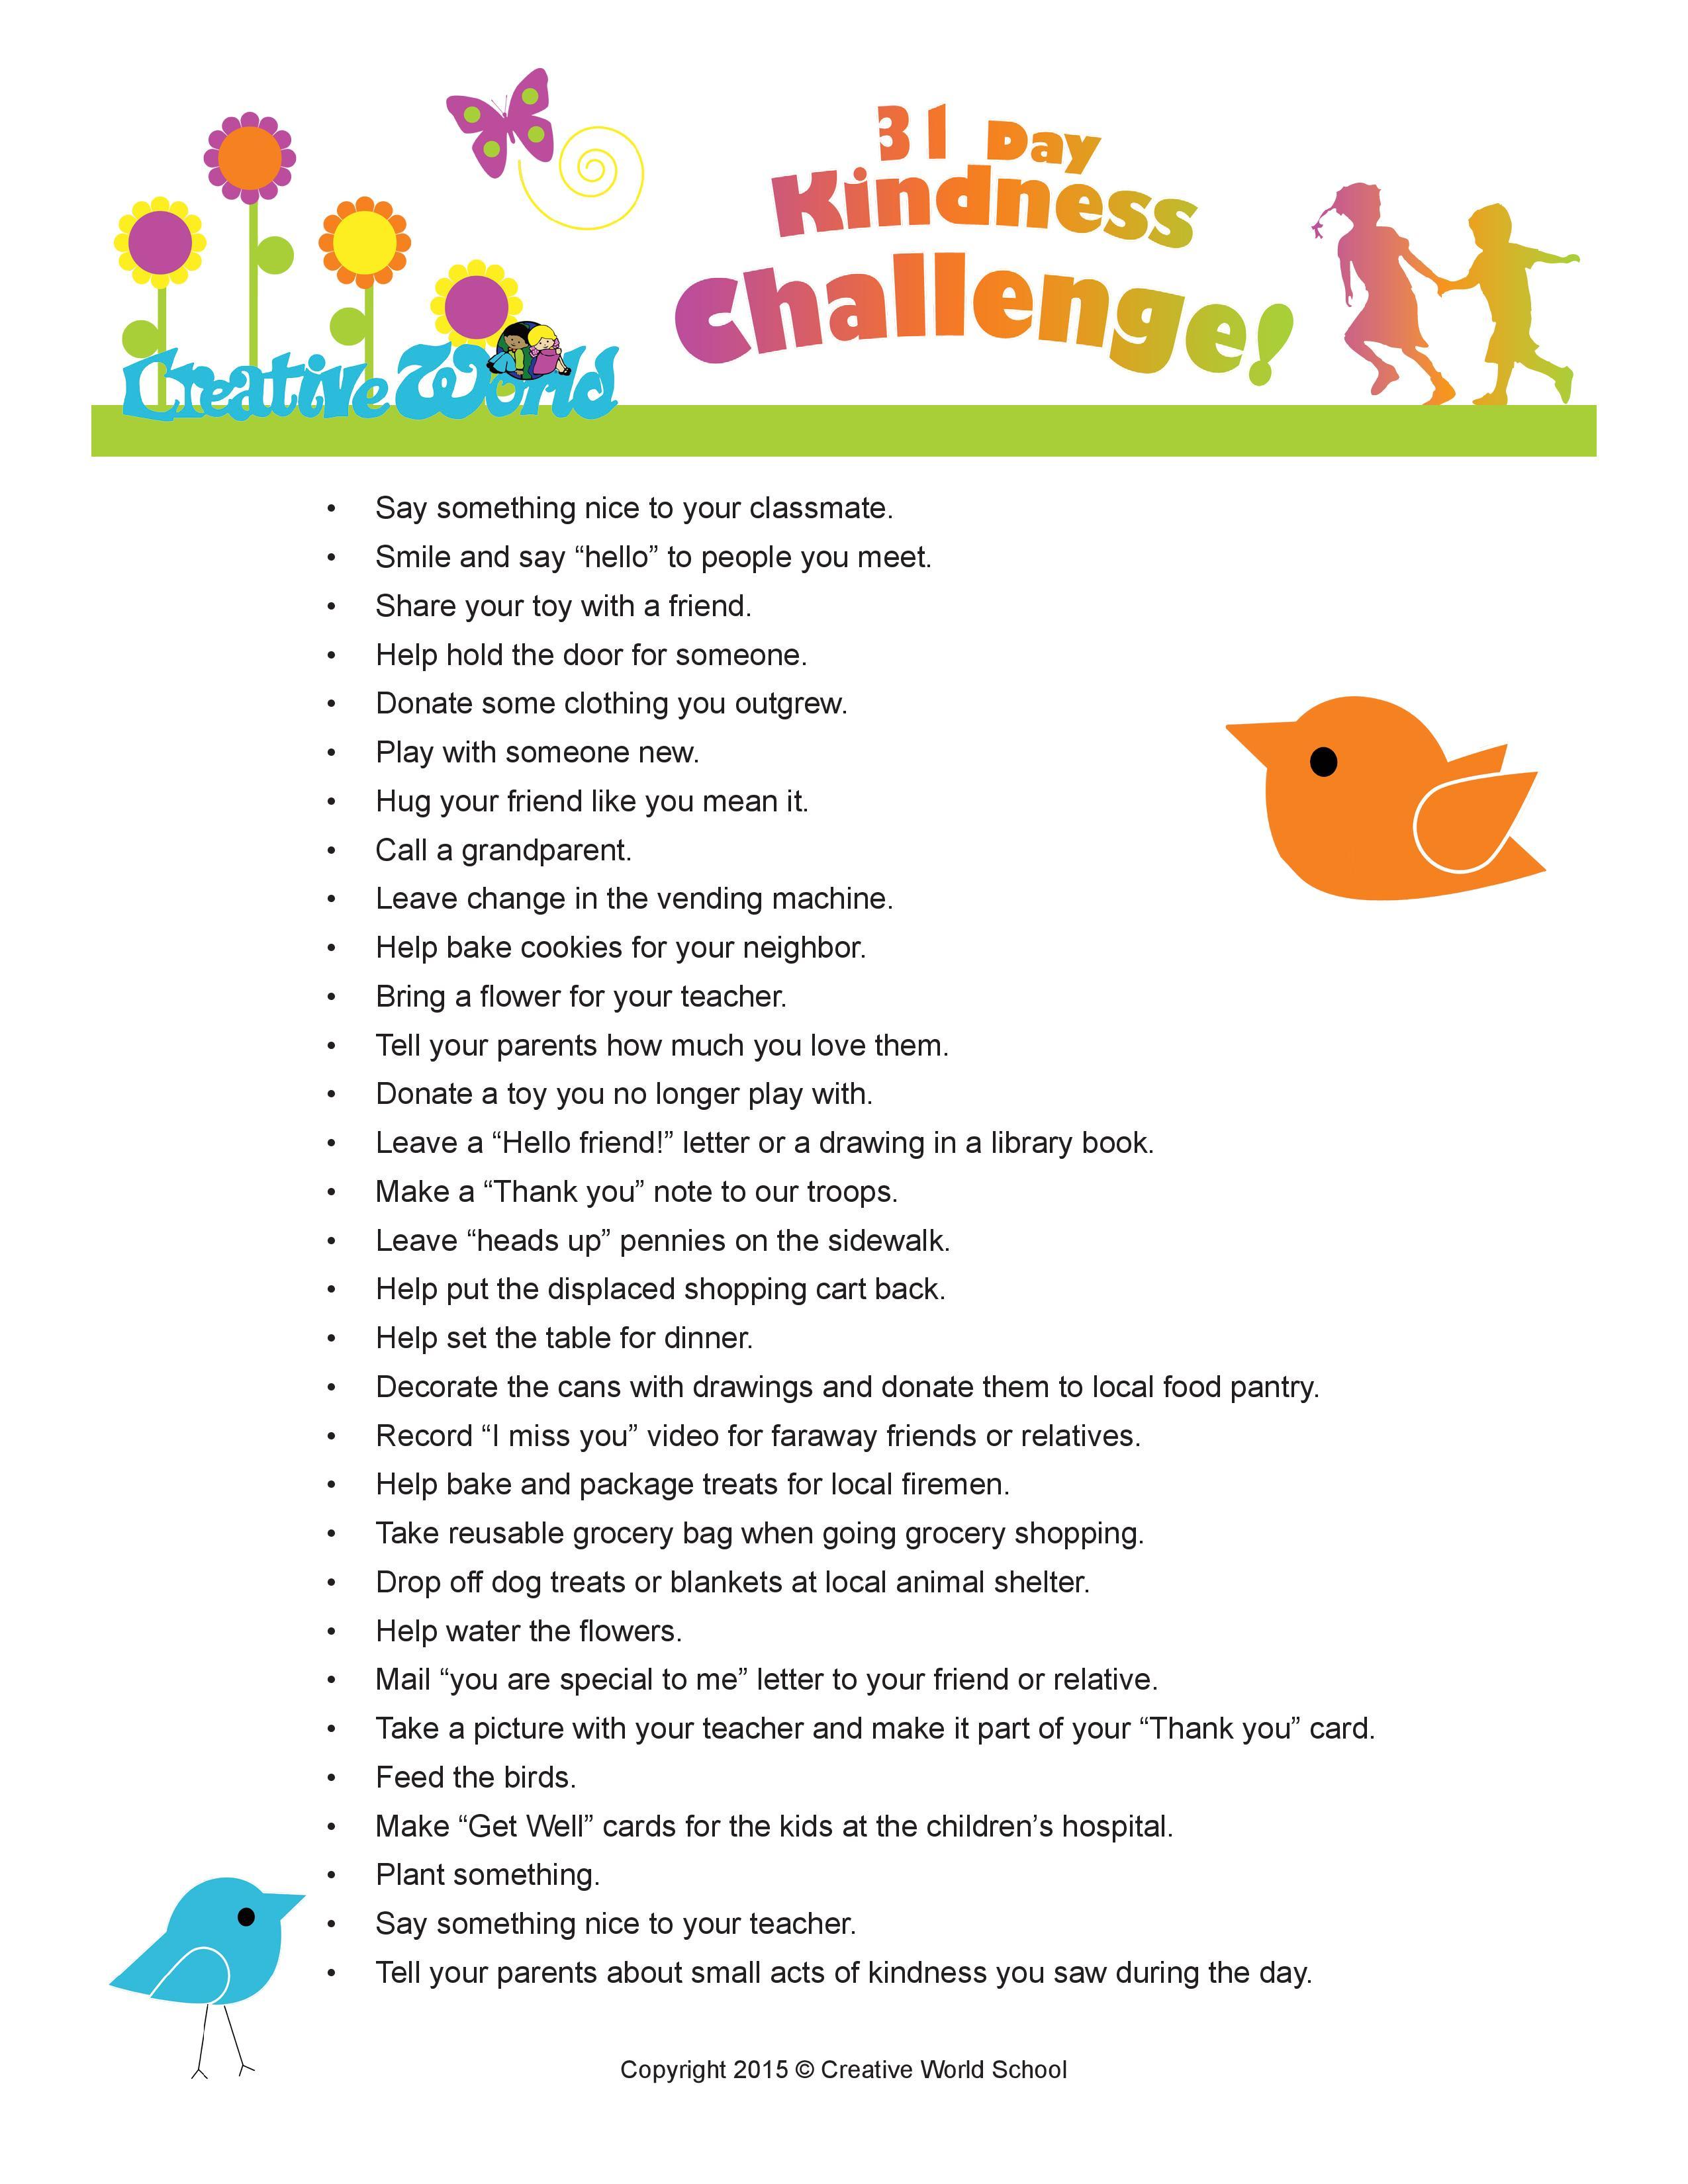 Teaching Children Kindness 31 Day Kindness Challenge